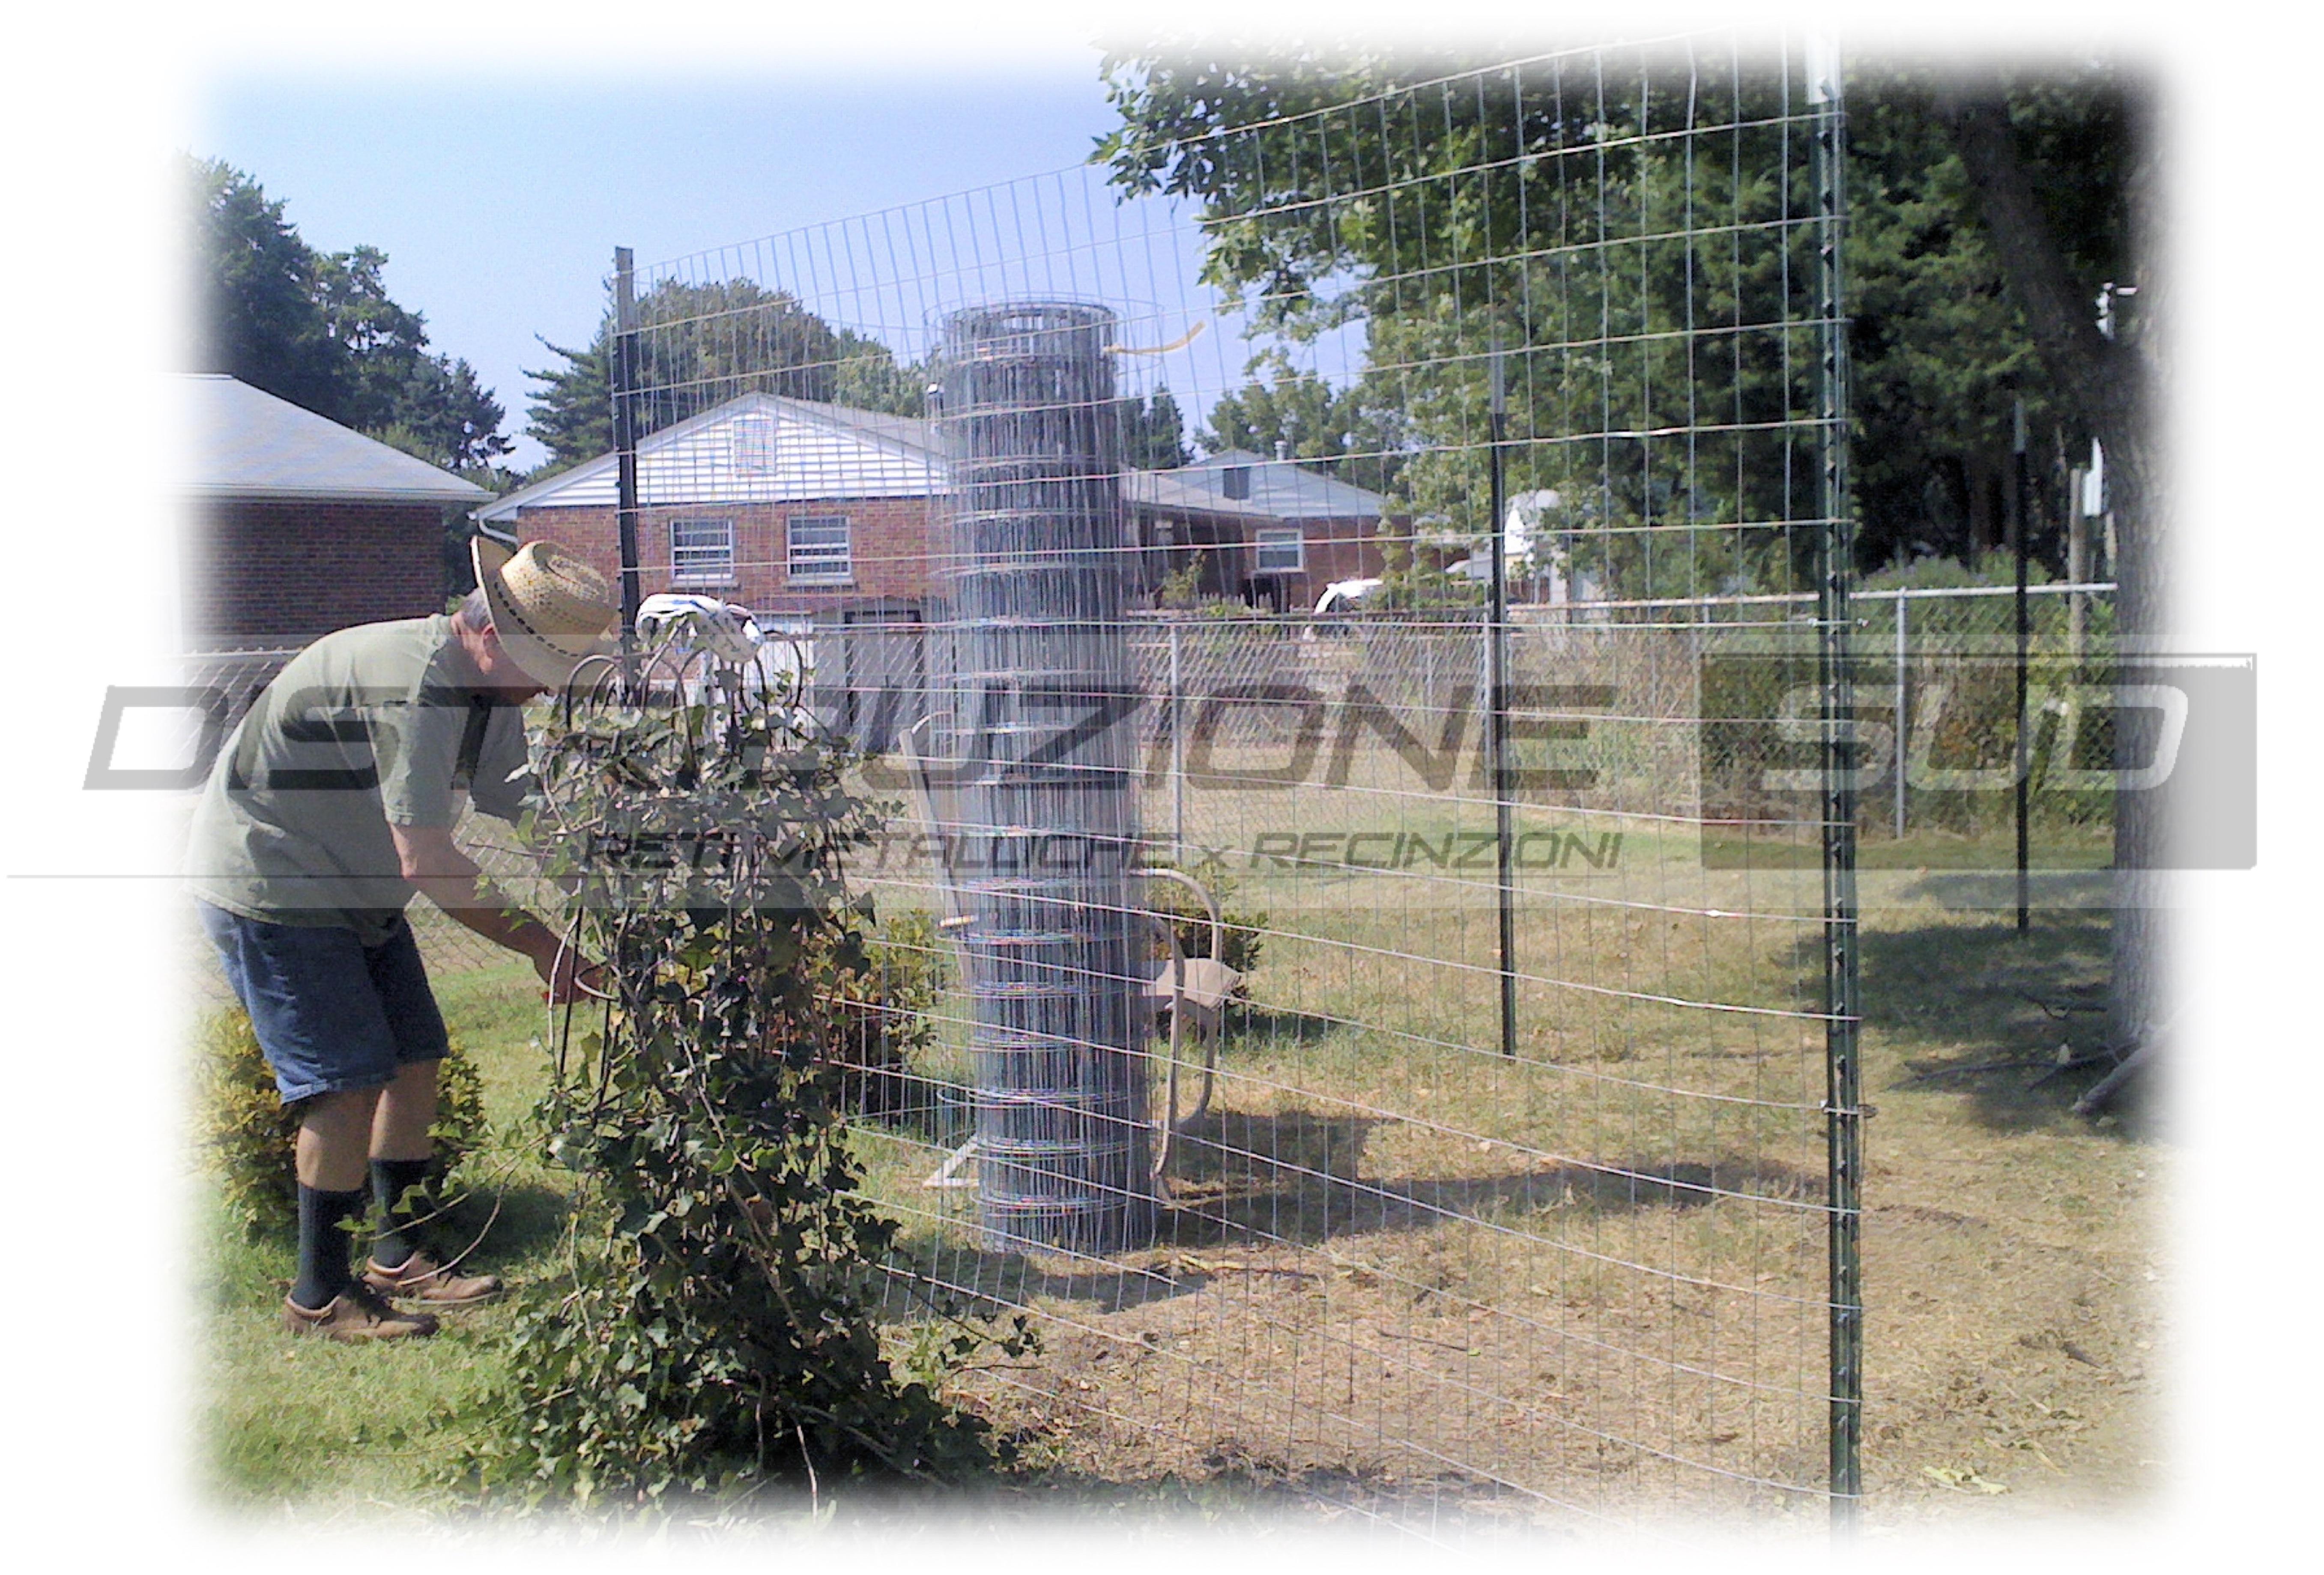 Posa del Kit rete elettrosaldata 5x7 con pali verdi